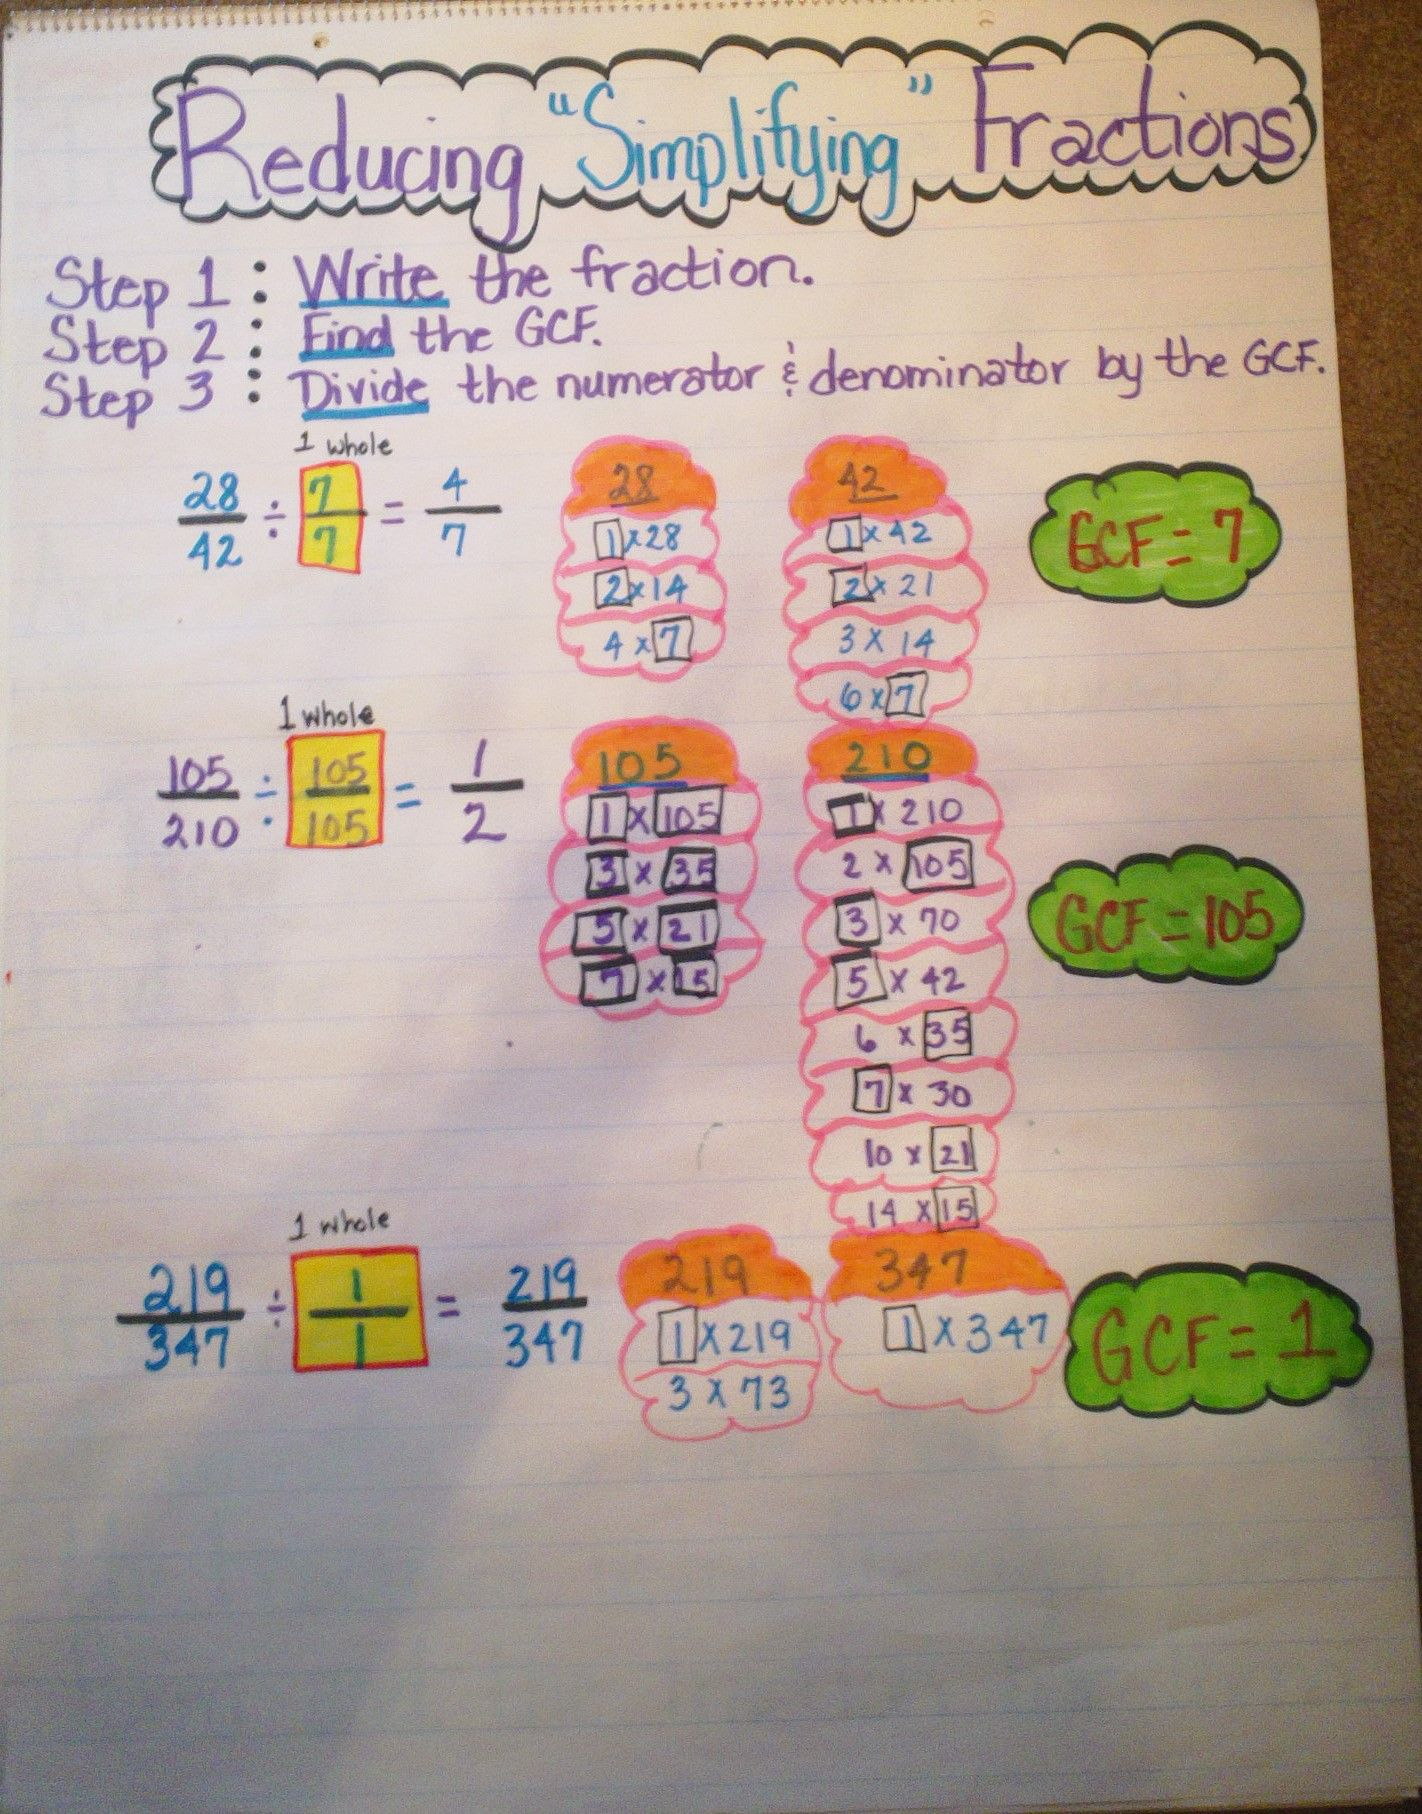 Reducing Simplifying Fractions